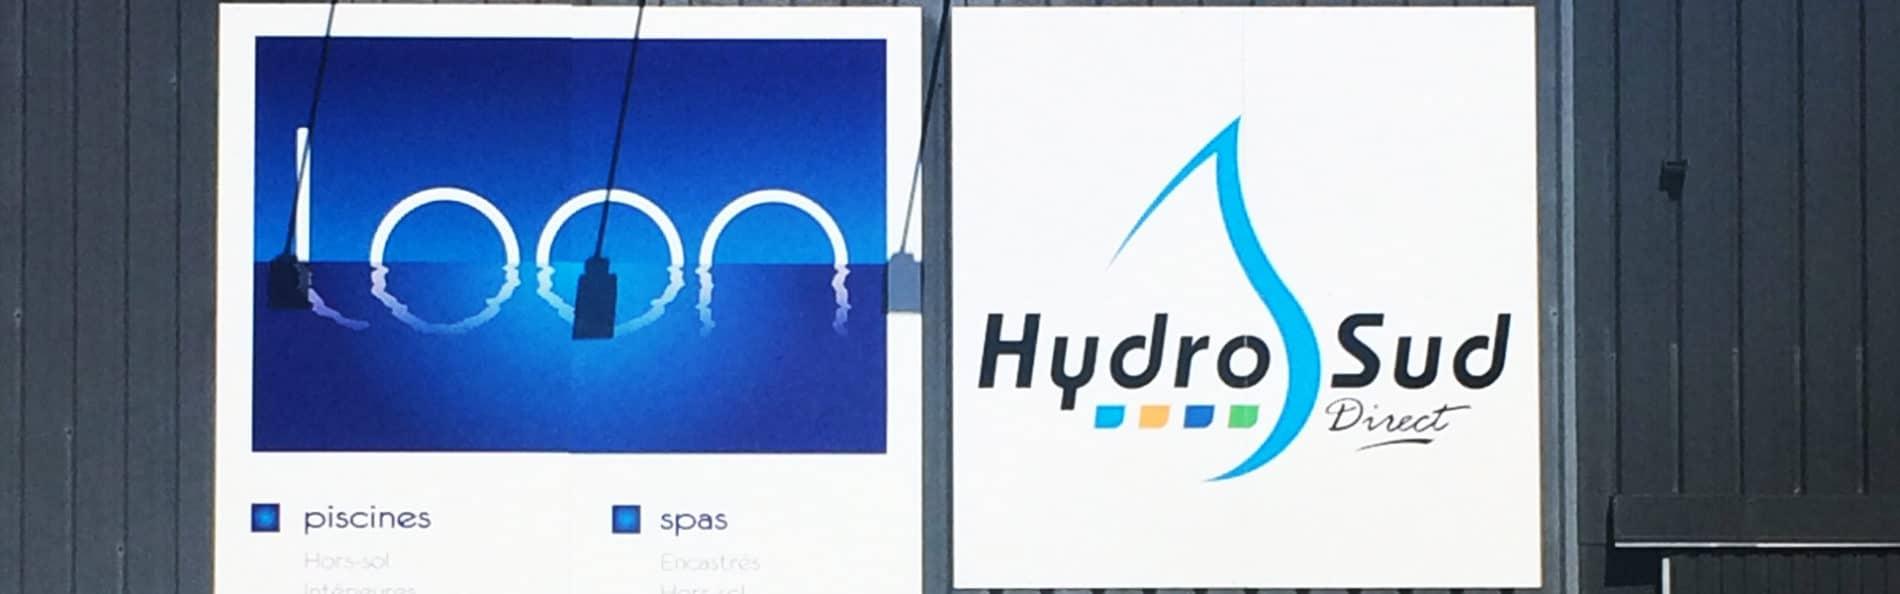 loon piscines et spas hydro sud besan on id es piscine. Black Bedroom Furniture Sets. Home Design Ideas